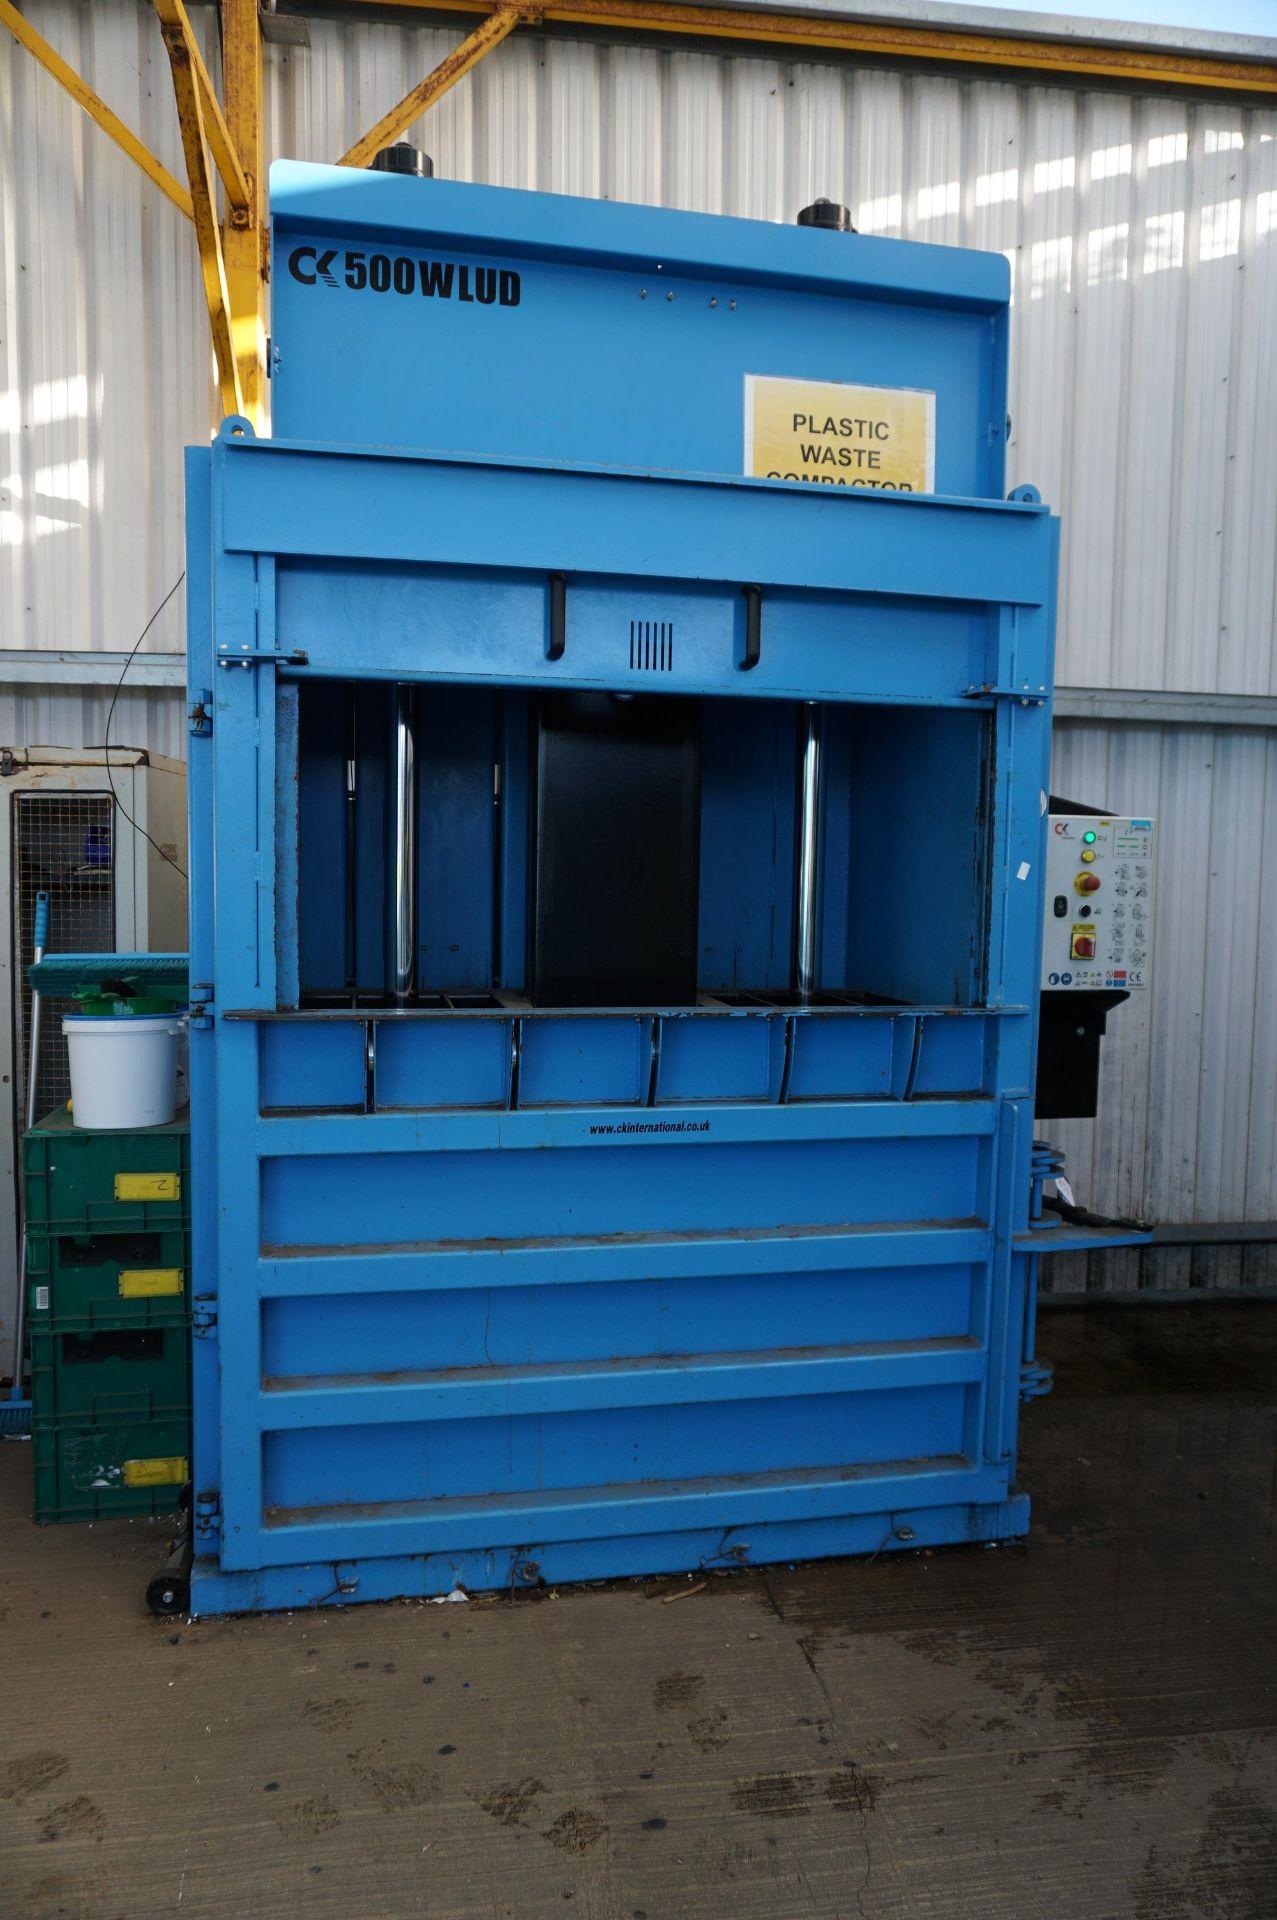 FuturFirst CK500WLUD hydraulic general waste compactor with CK international control unit